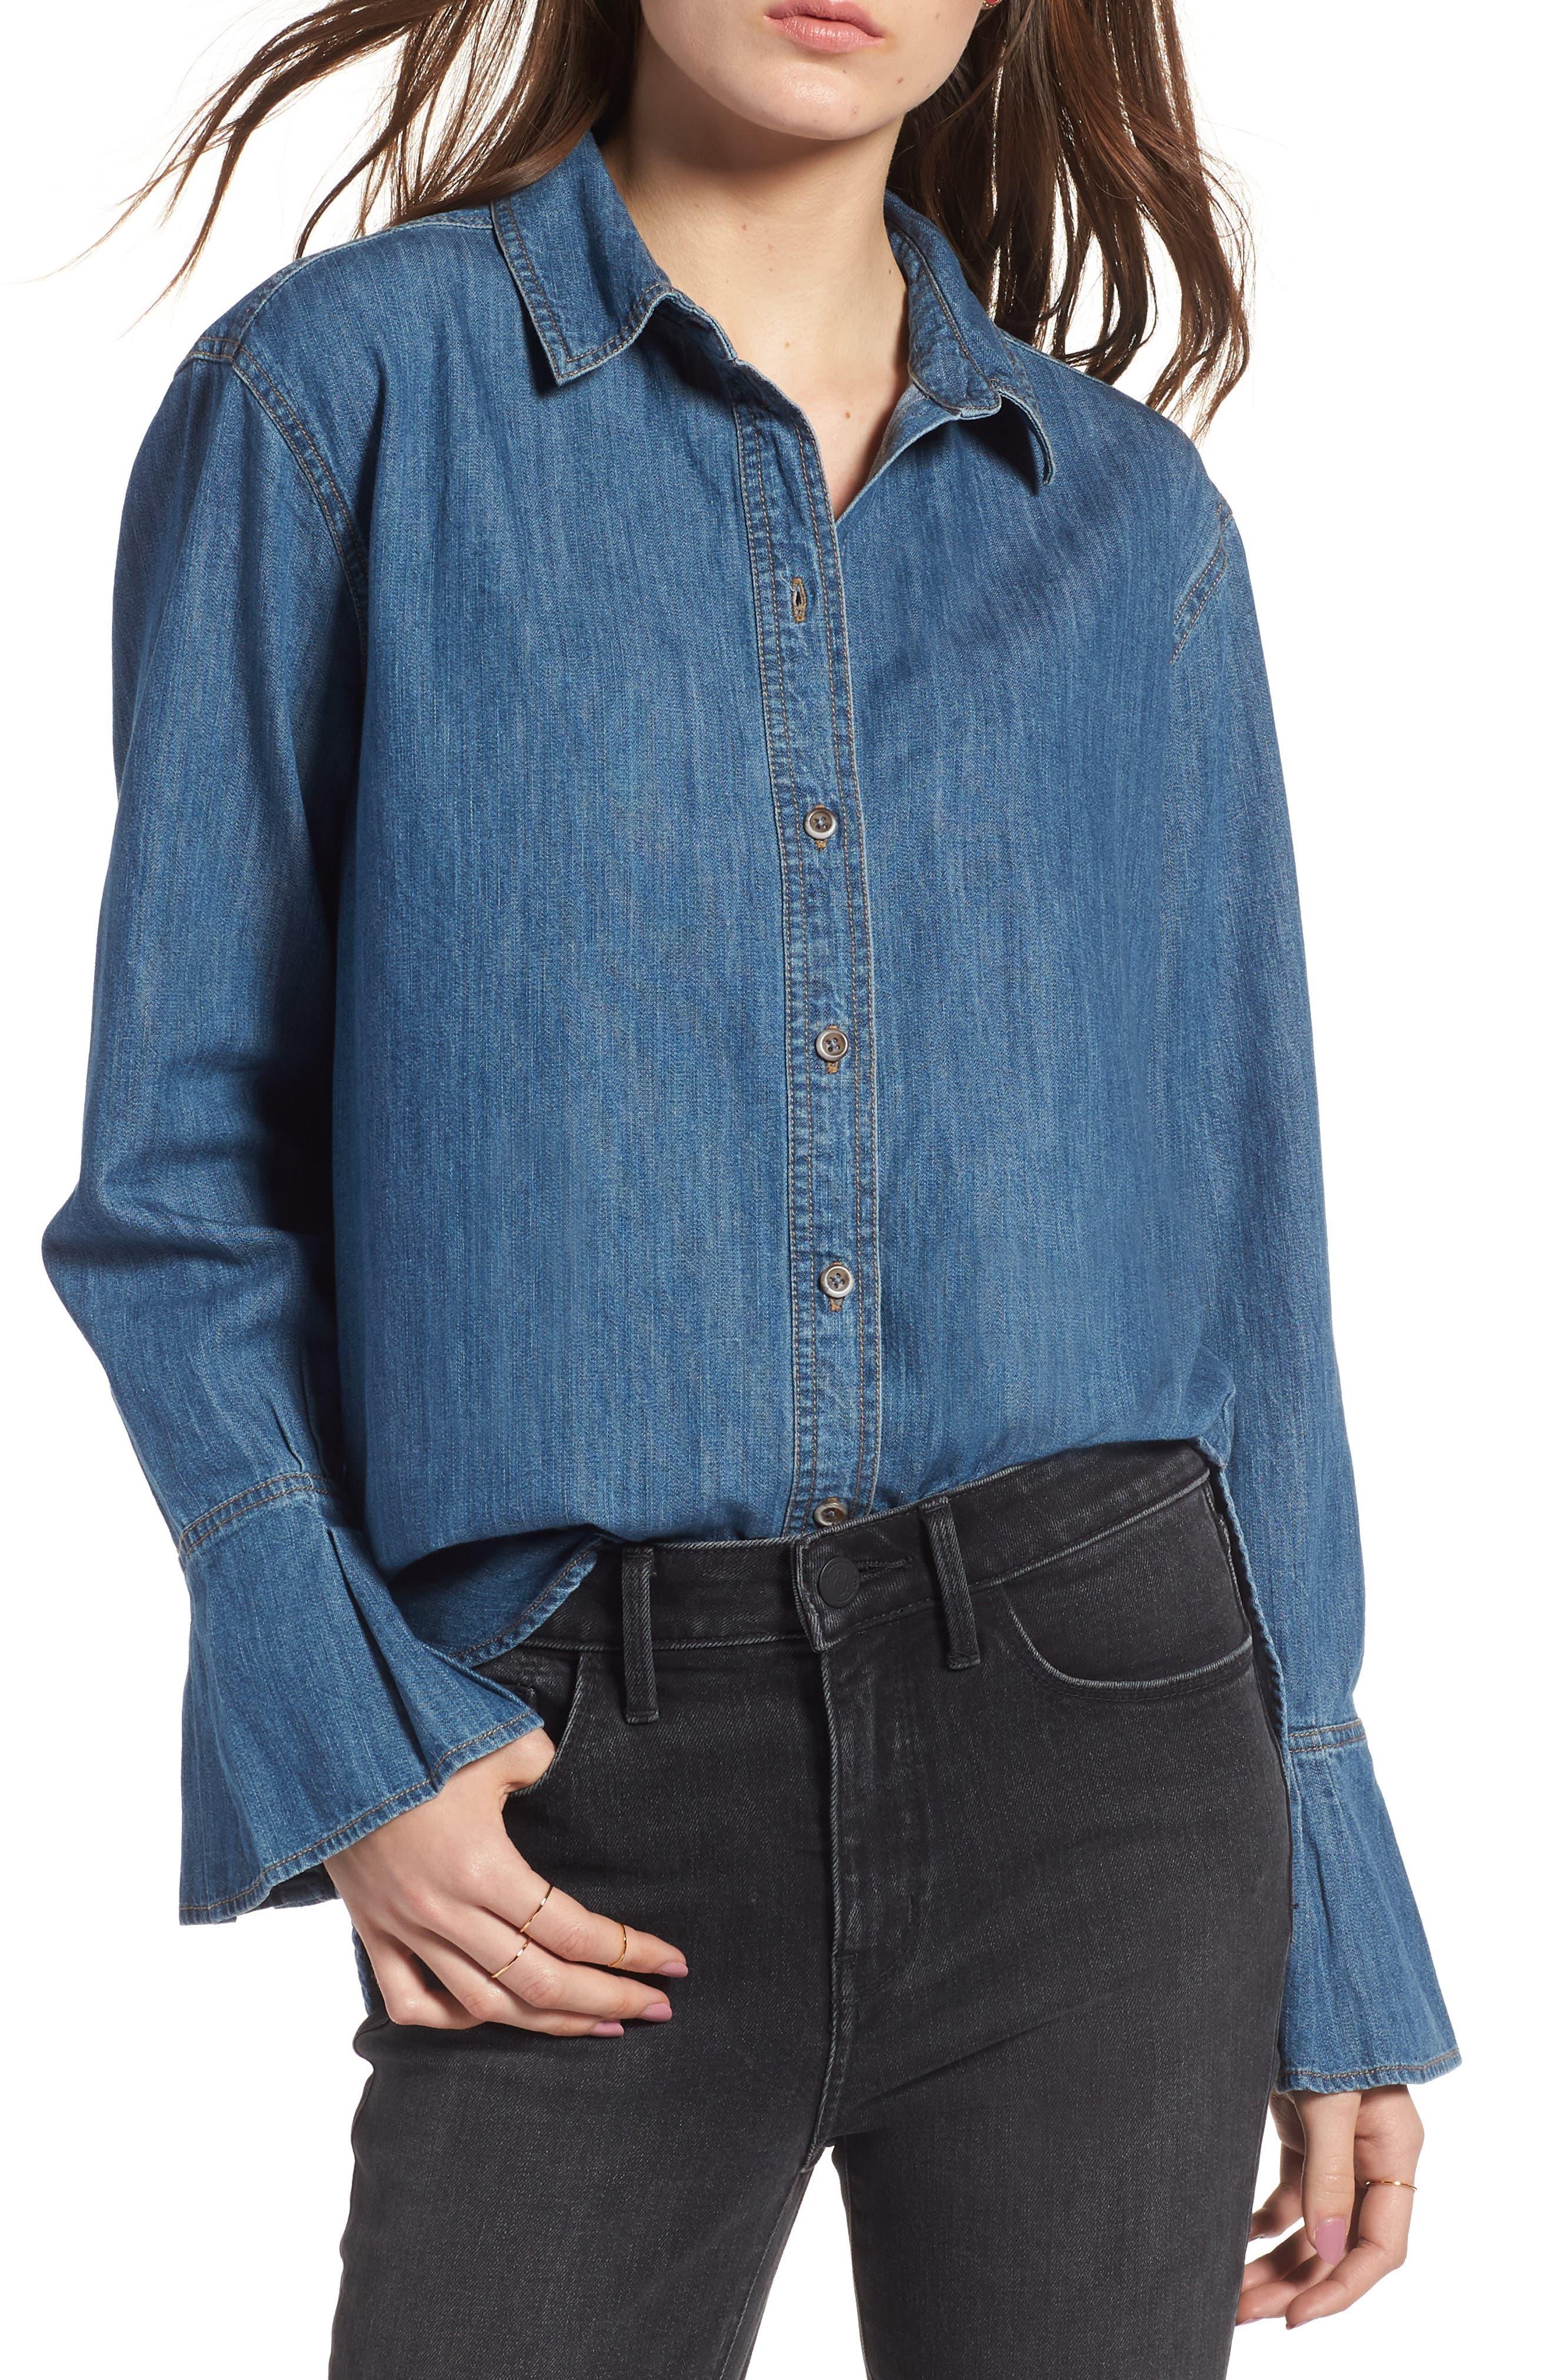 TREASURE & BOND Pleated Cuff Chambray Shirt, Main, color, 420